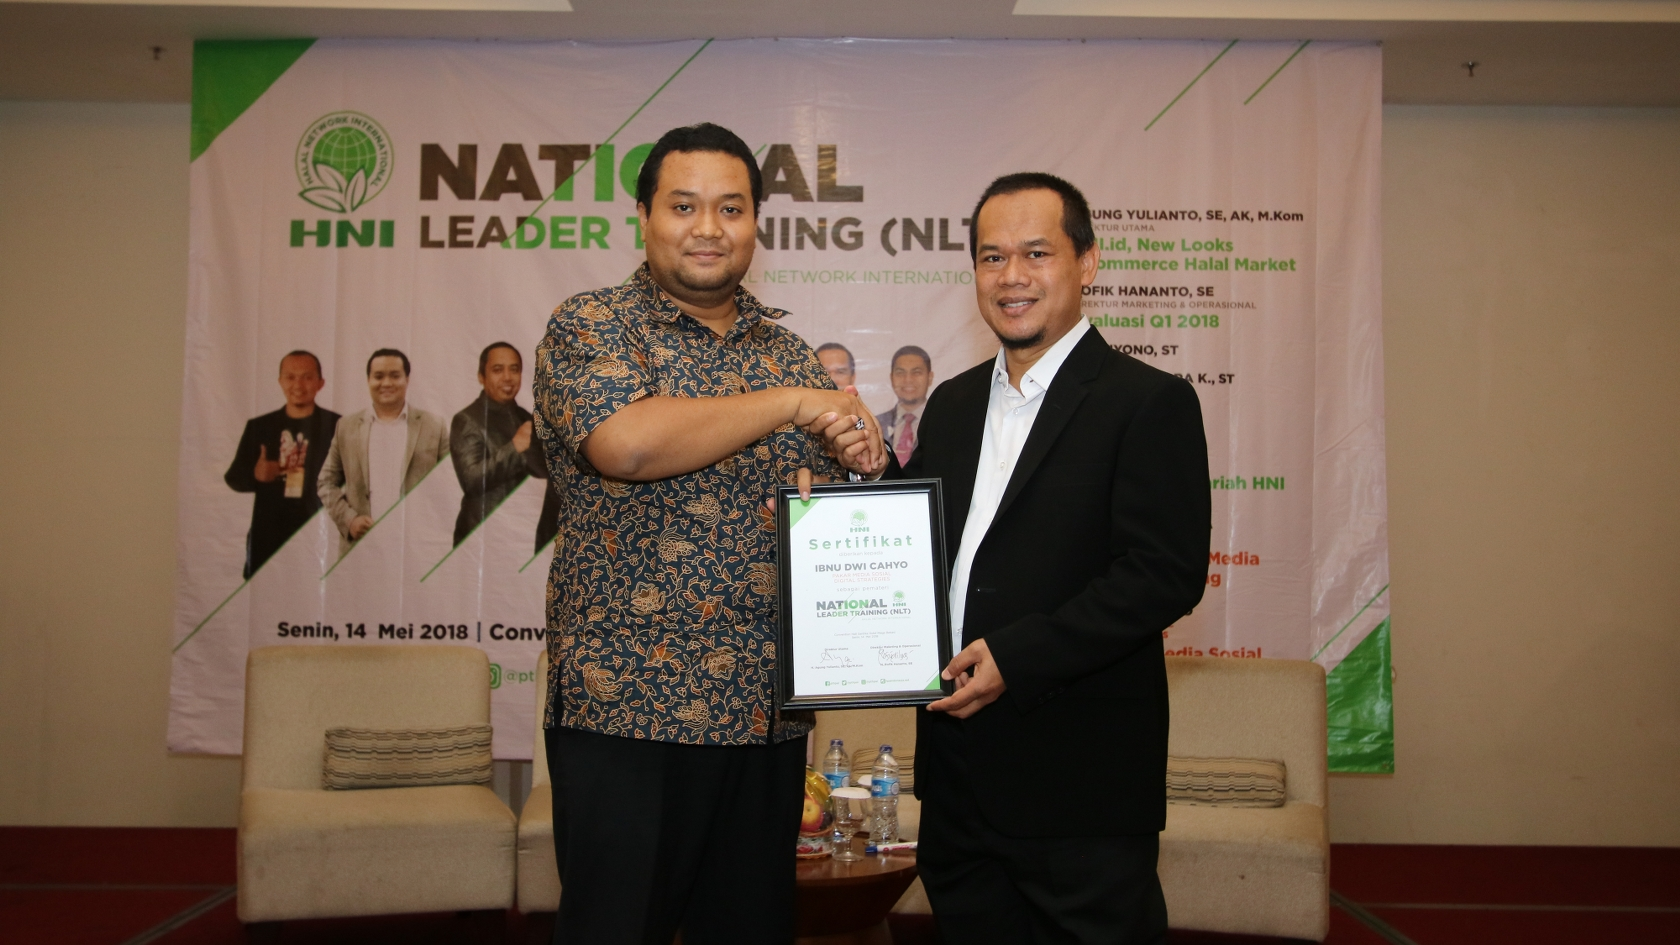 National Leader Training